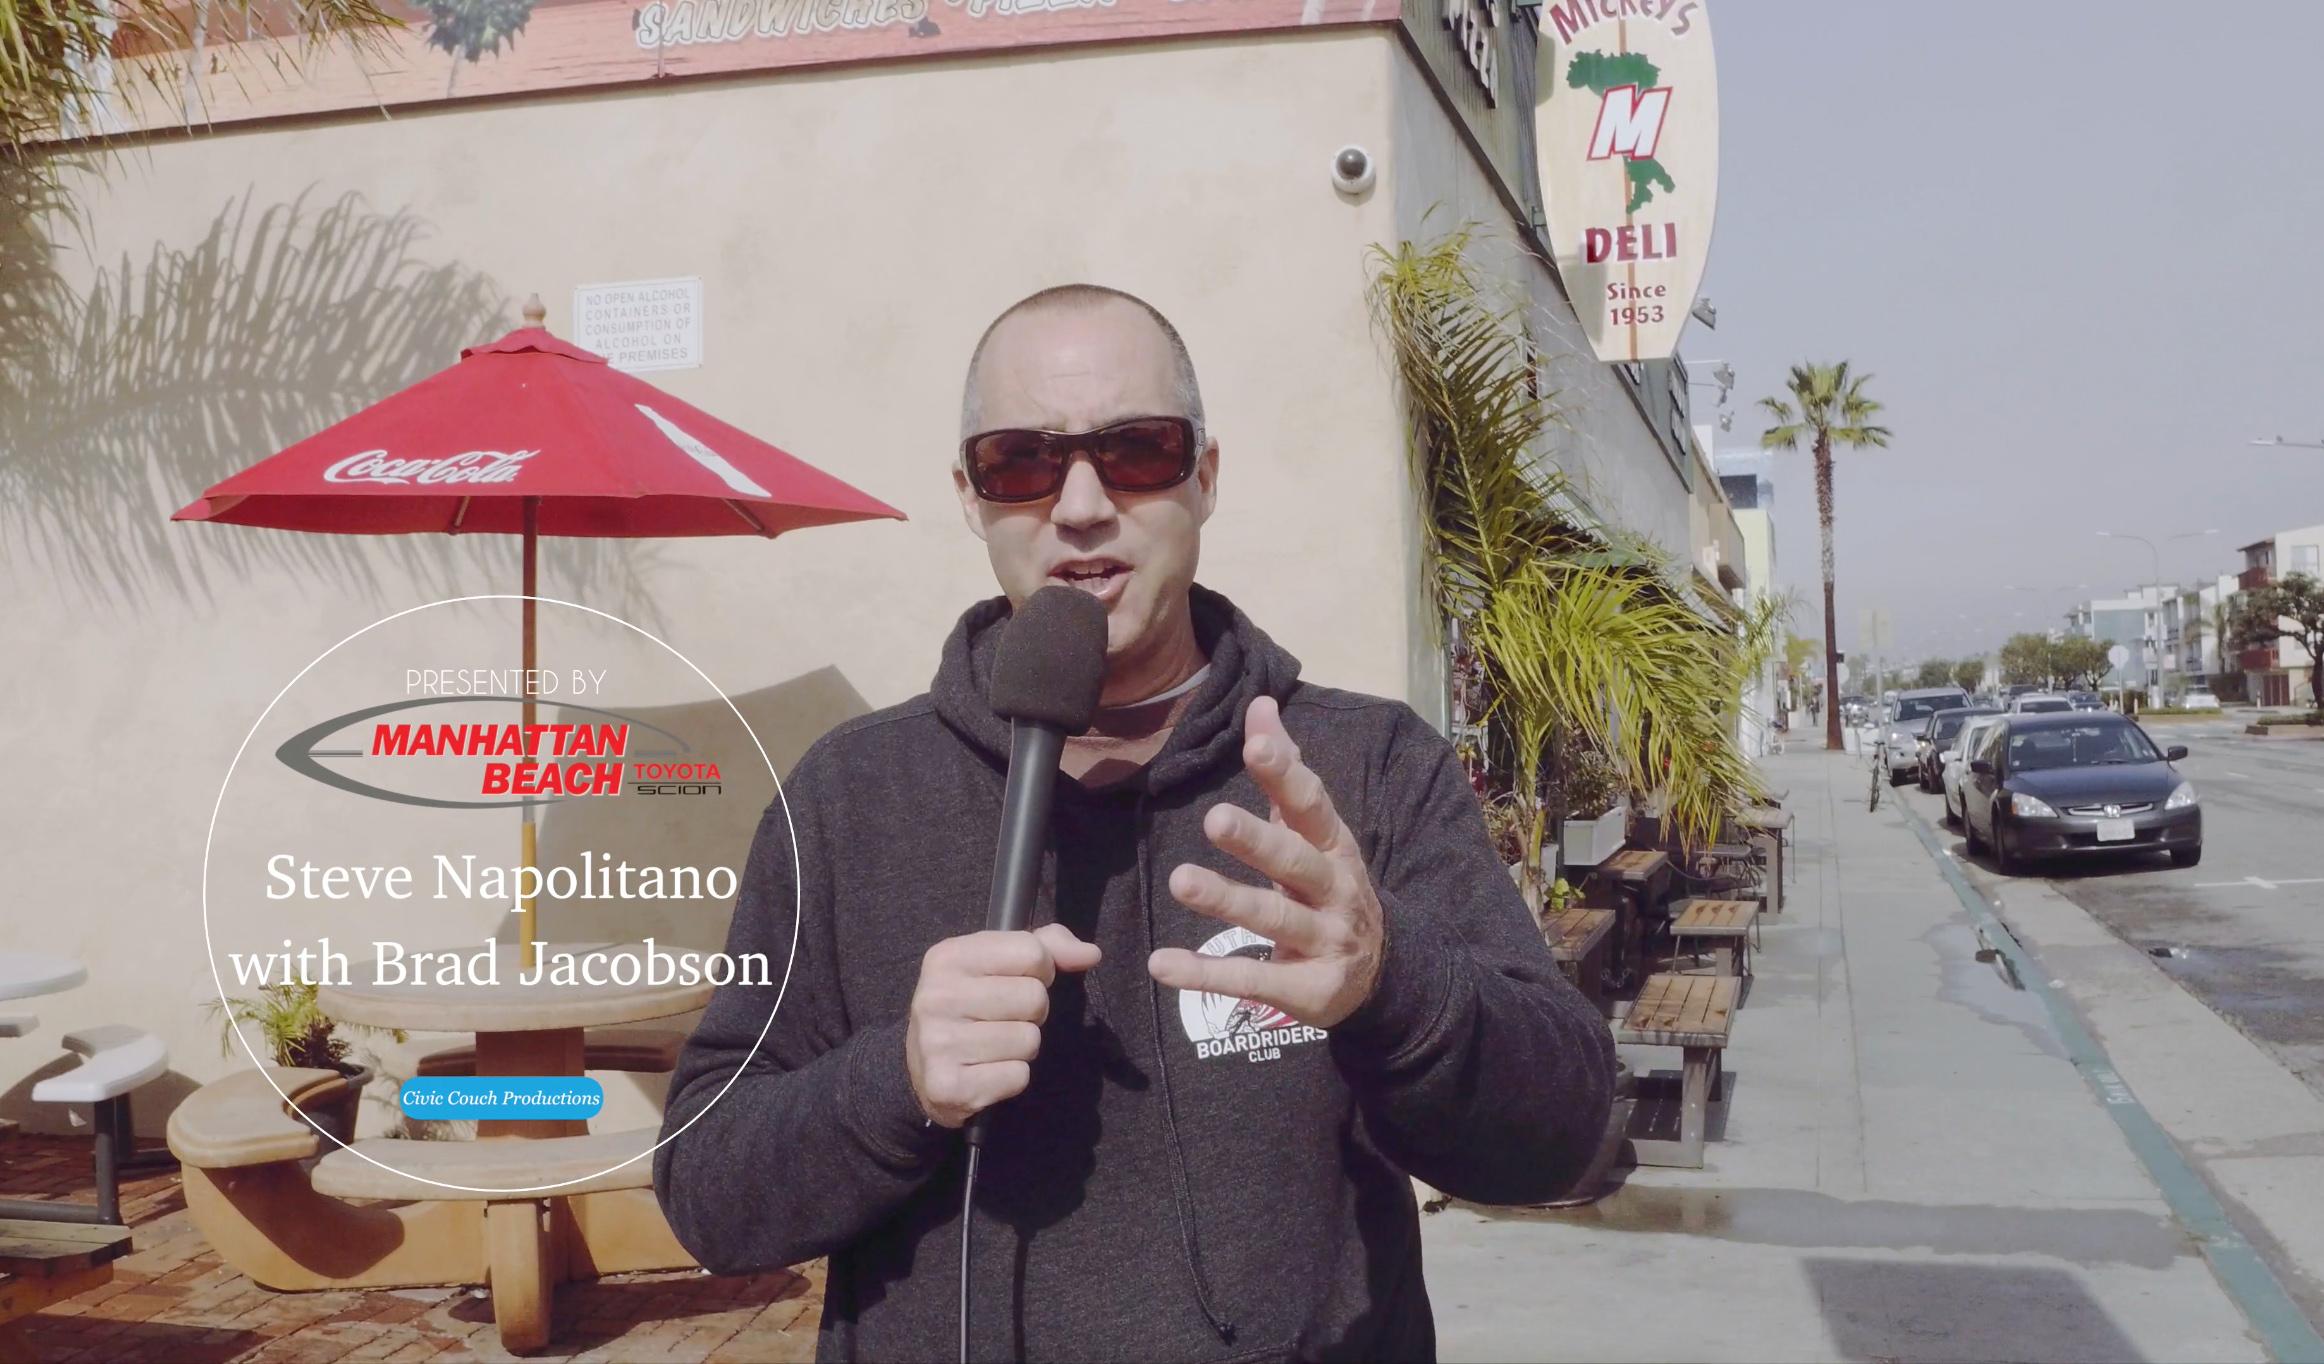 The Past and Future of Mickey's Deli in Hermosa Beach (Video)